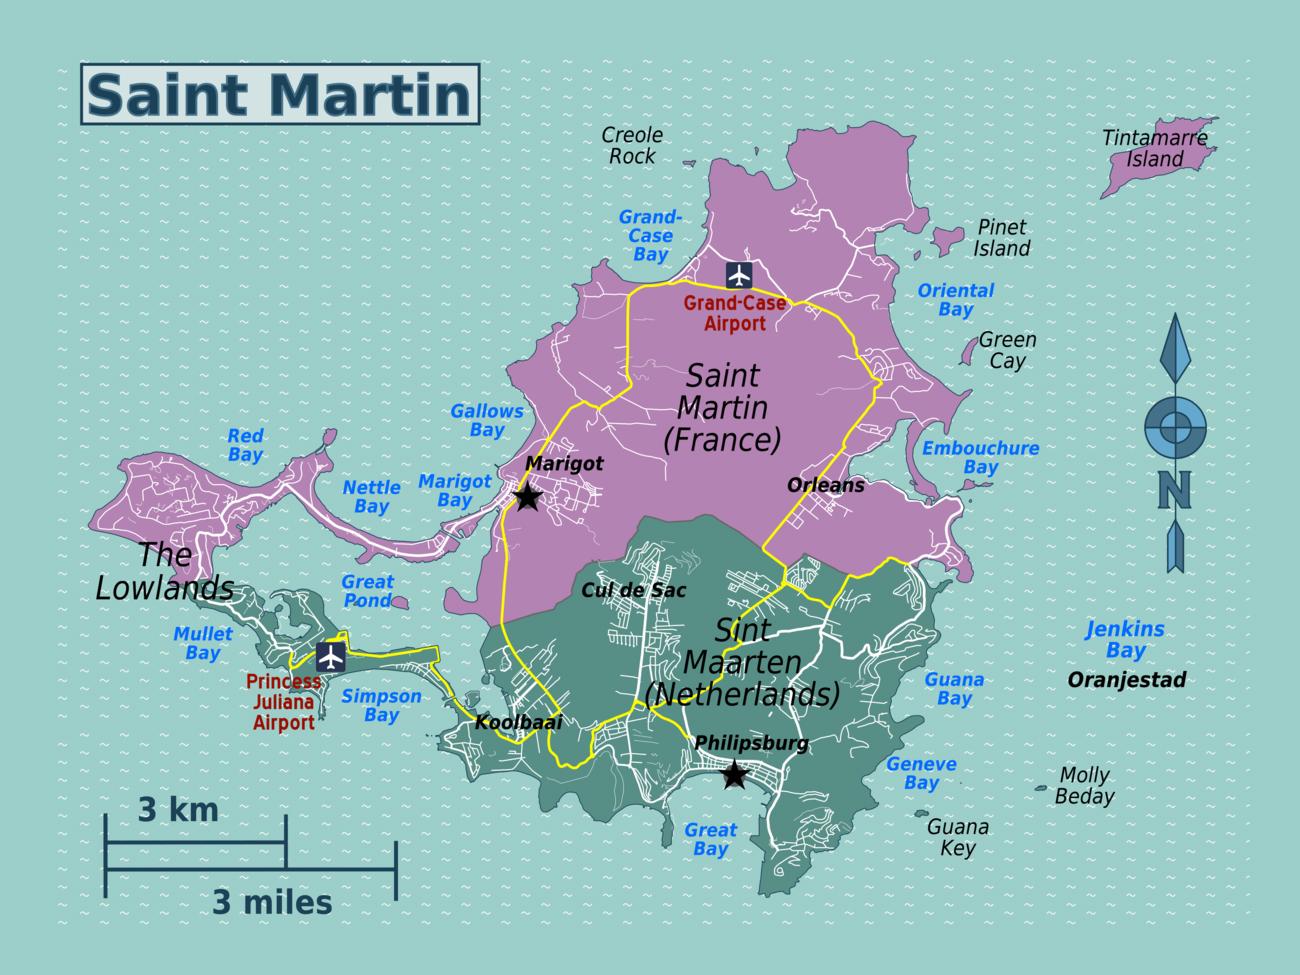 Detailed map of Sint Maarten, Saint Martin with roads ... on aruba map, st. maarten road map, anguilla map, portugal map, guana bay map, bahamas map, st. maarten cruise port map, barbados map, satawal island map, virgin islands map, st. maarten resort map, simpson bay map, caribbean map, st maarten water taxi map, charlotte amalie map, cayman islands map, saint eustatius map, bvi map, canada map, saint lucia location map,